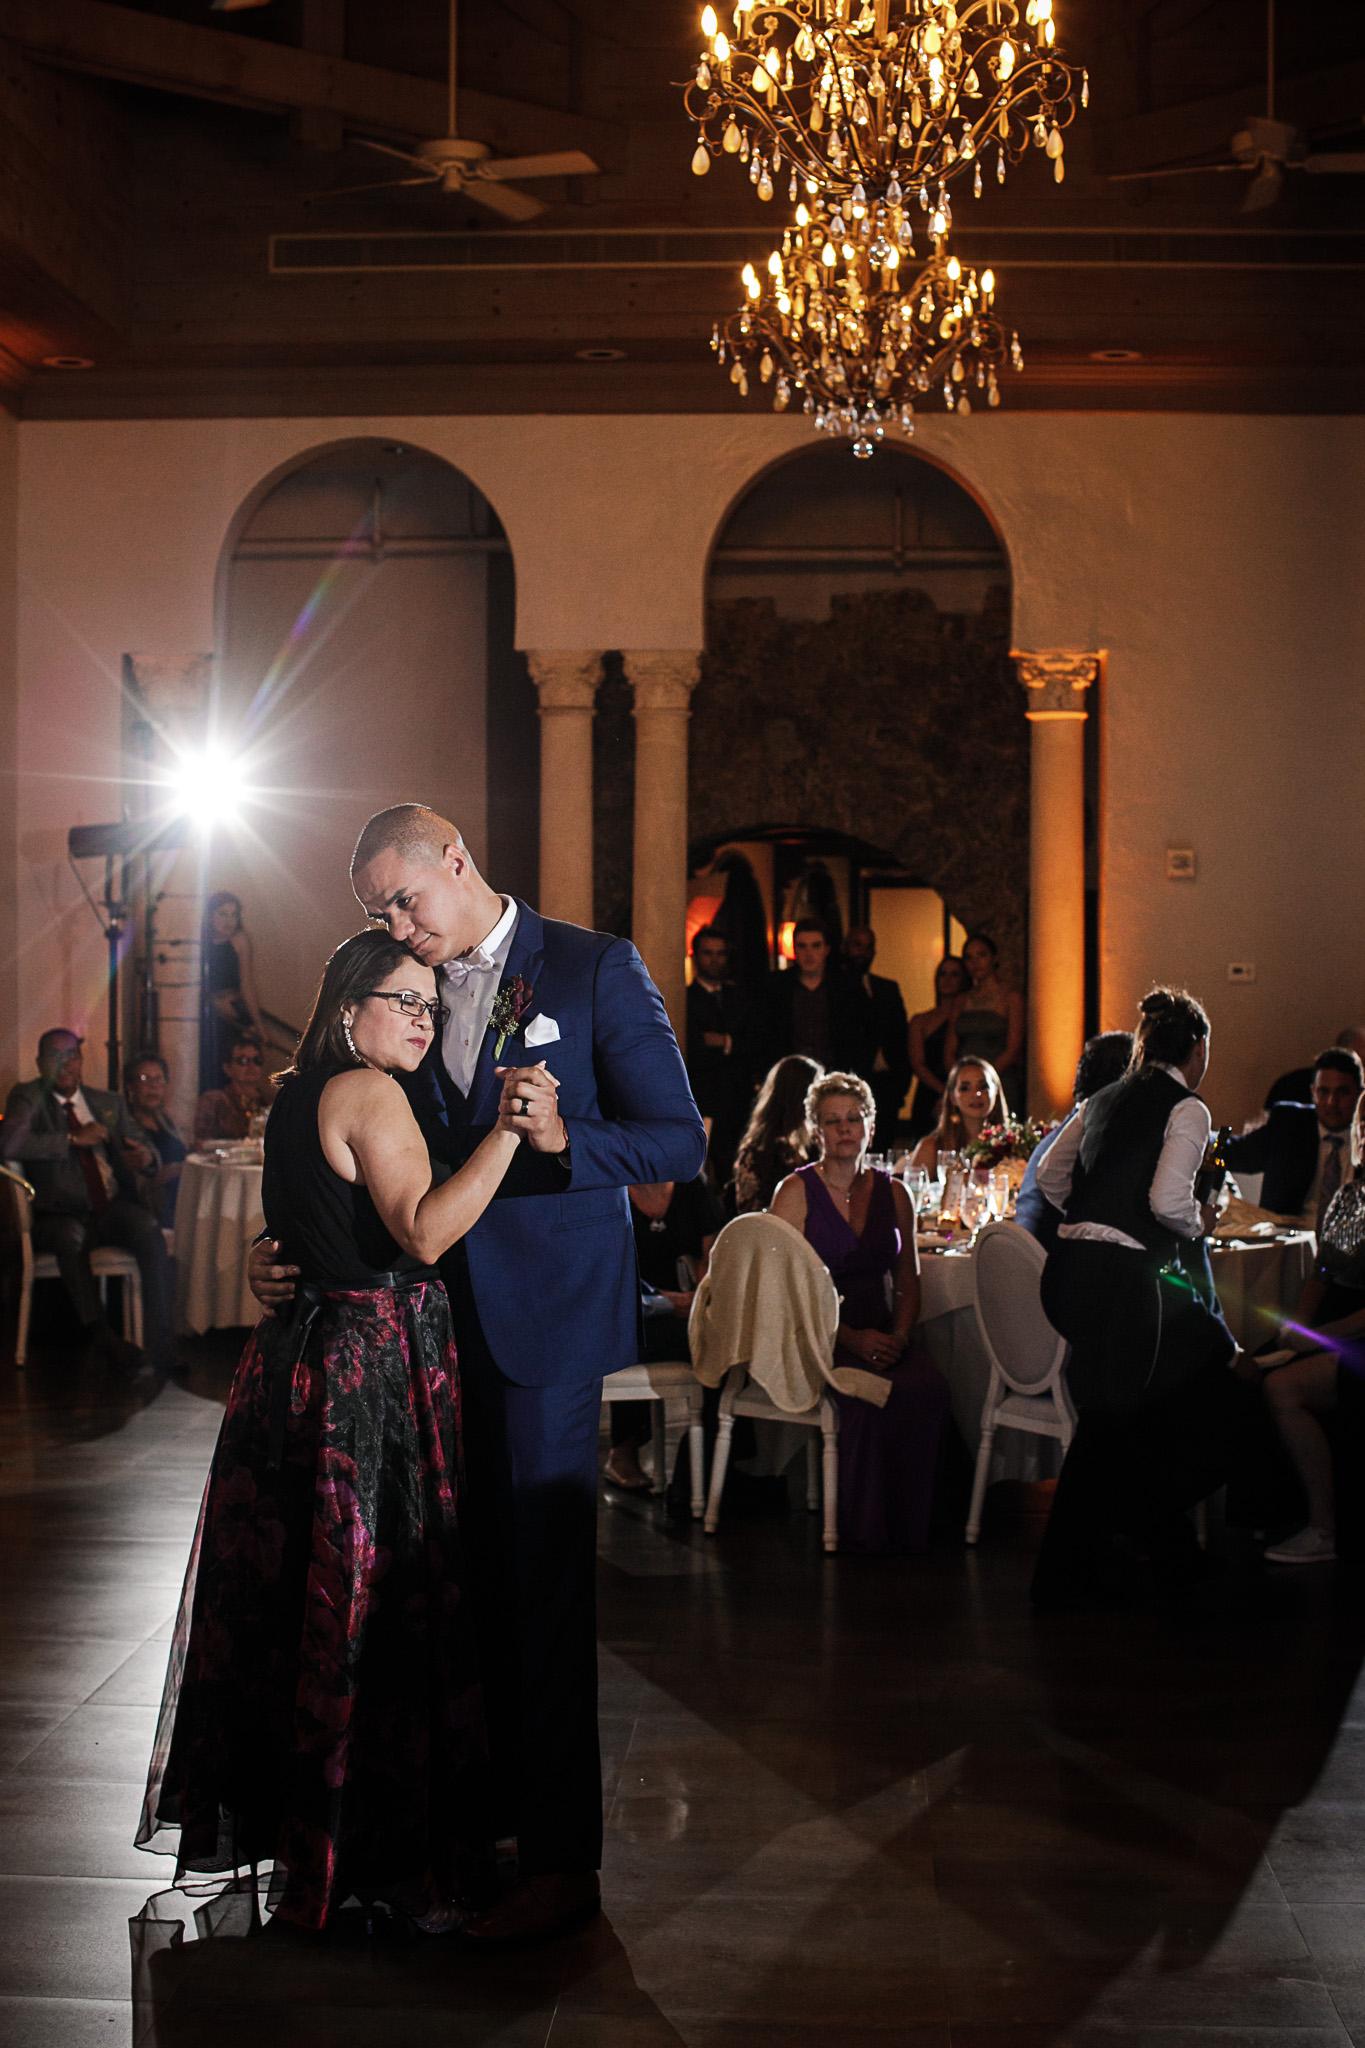 Miami-Wedding-Photographer-Coral-Gables-Venue-Groom-Mother-Dance